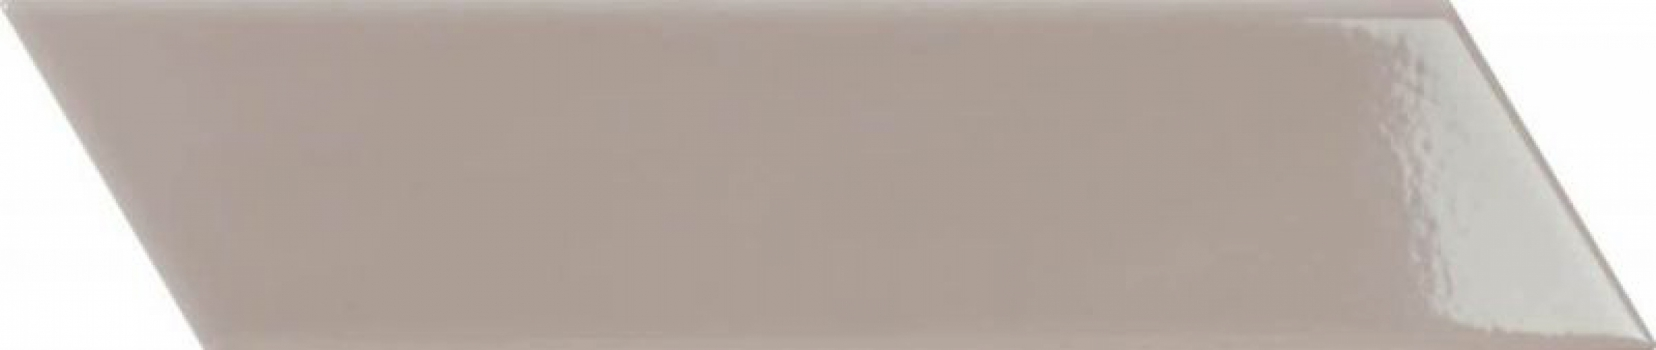 плитка настенная chevron grey right 6,4x26 см CEVICA Grey Right